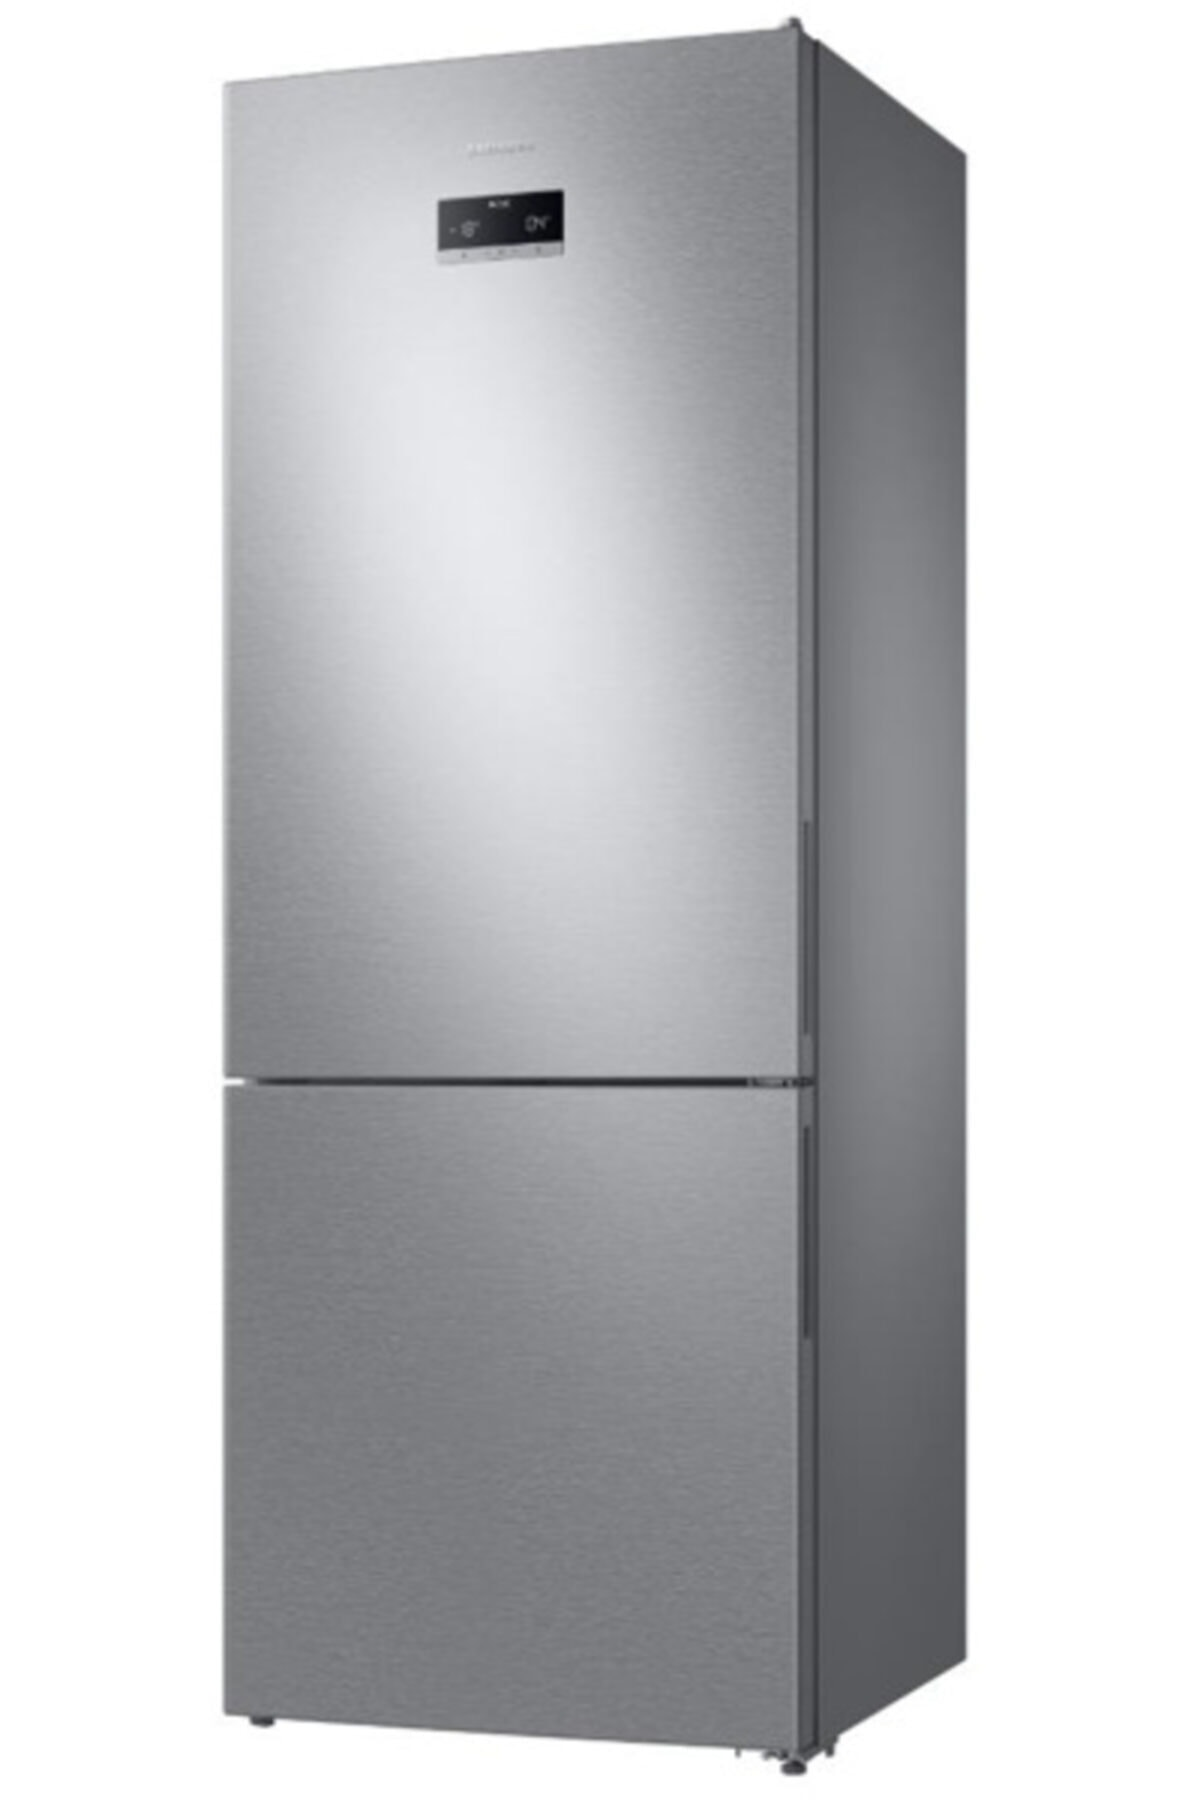 Samsung RB46TS334SA Twin Cooling Kombi No Frost Buzdolabı 1